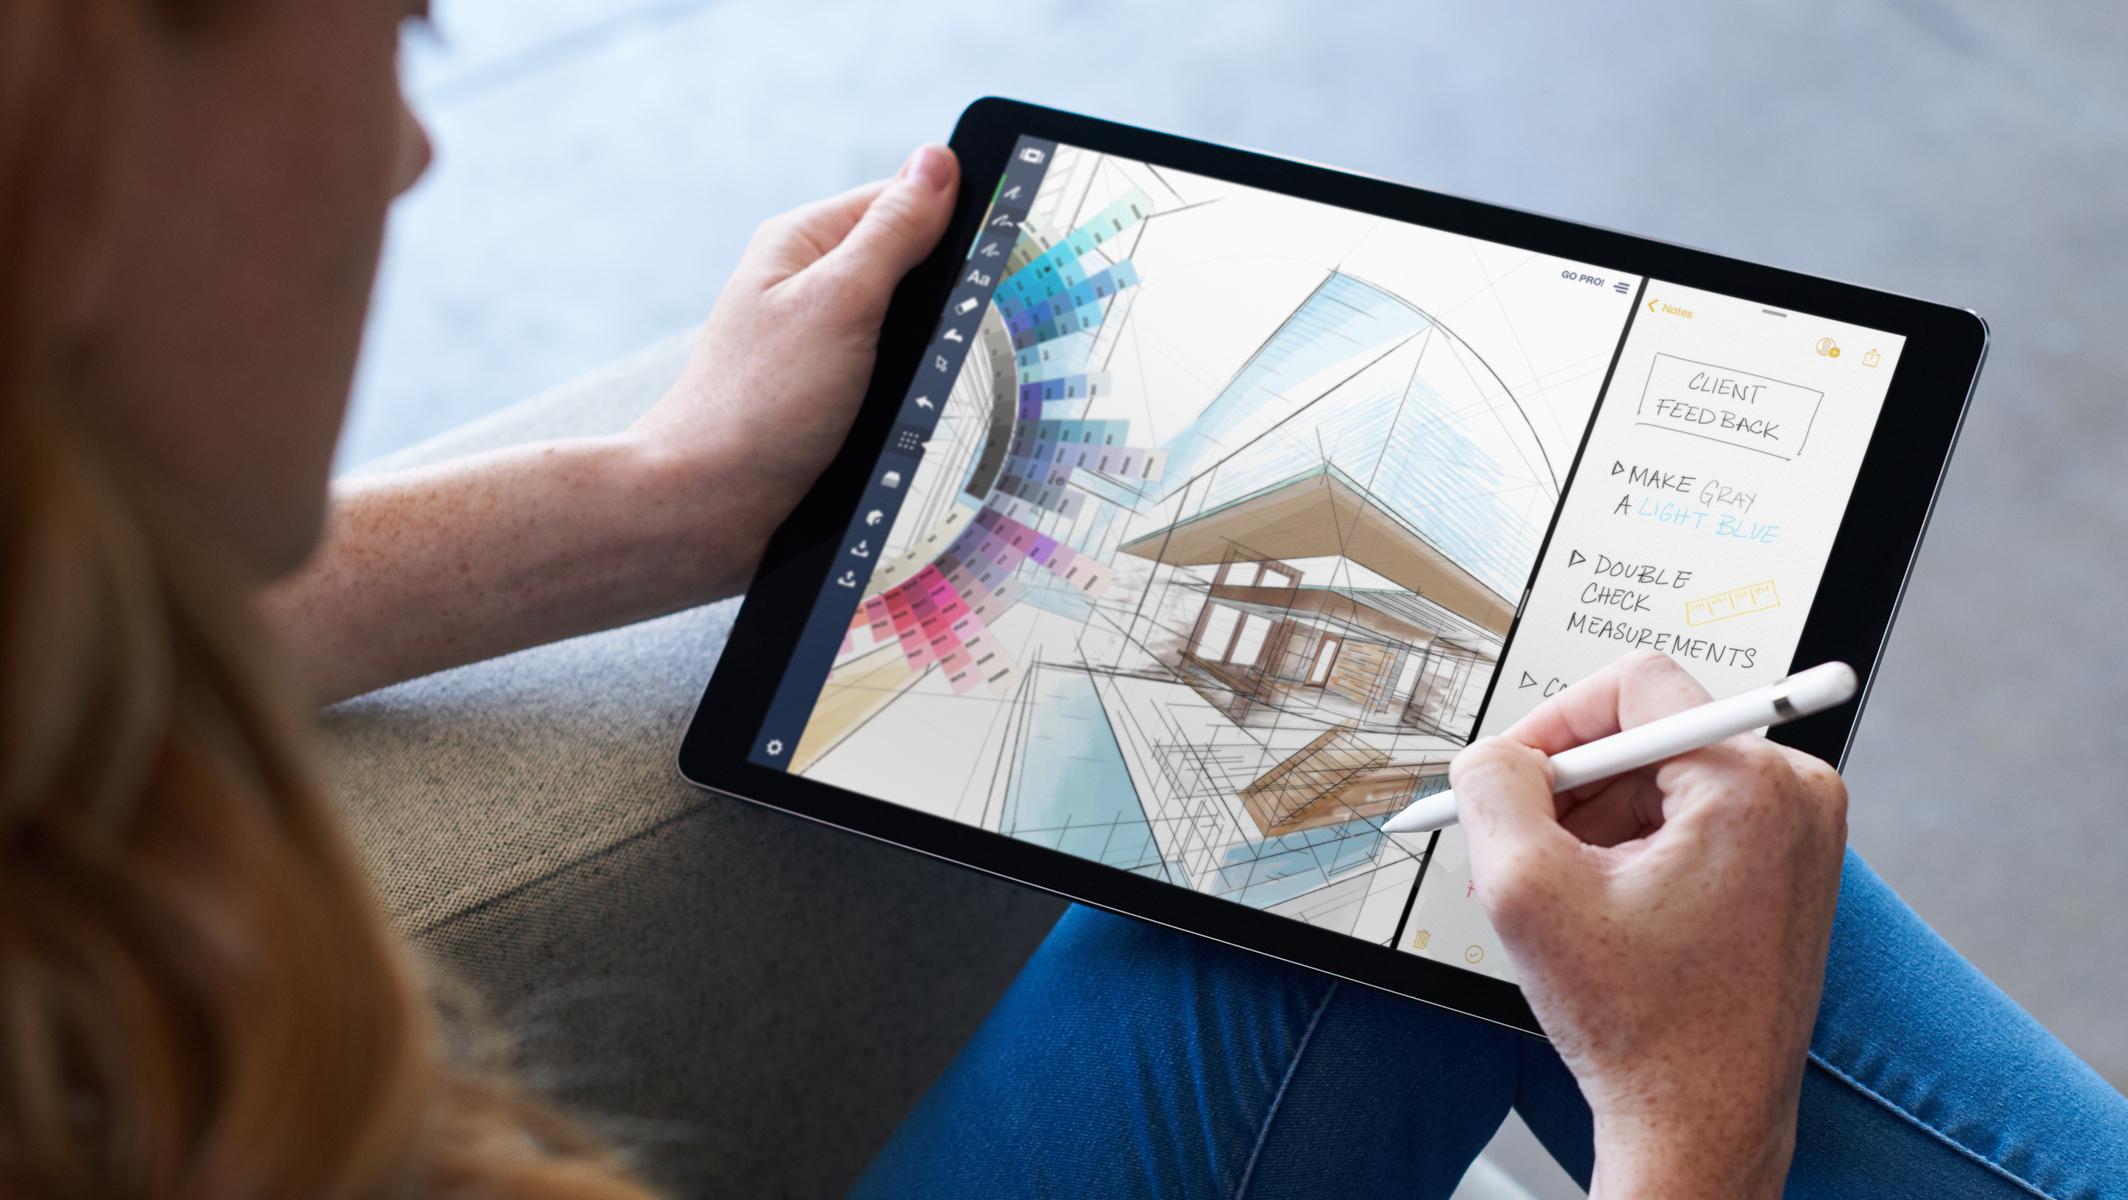 iOS 11, 올 가을 iPhone과 iPad에 강력한 신기능을 가져오다.